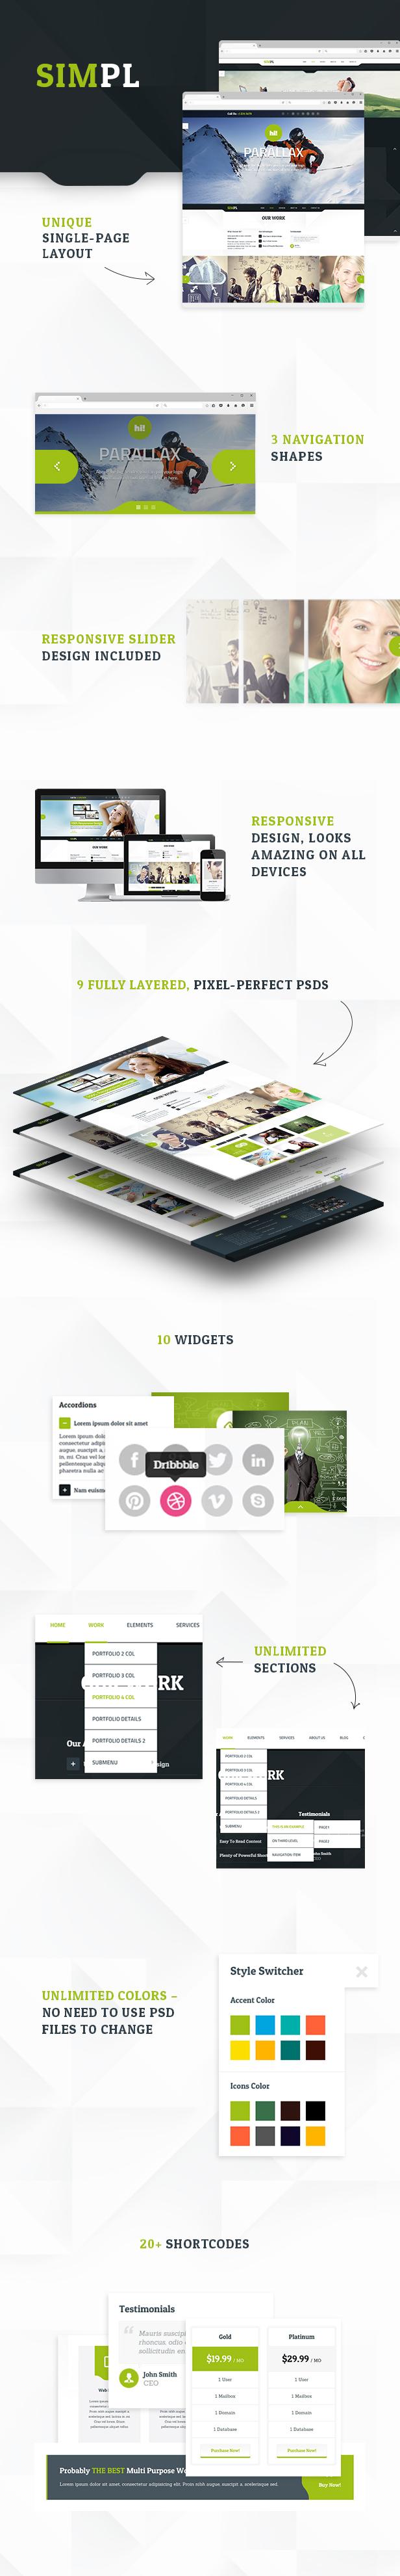 SIMPL - Clean Modern Portfolio & Business Site Tem - 8